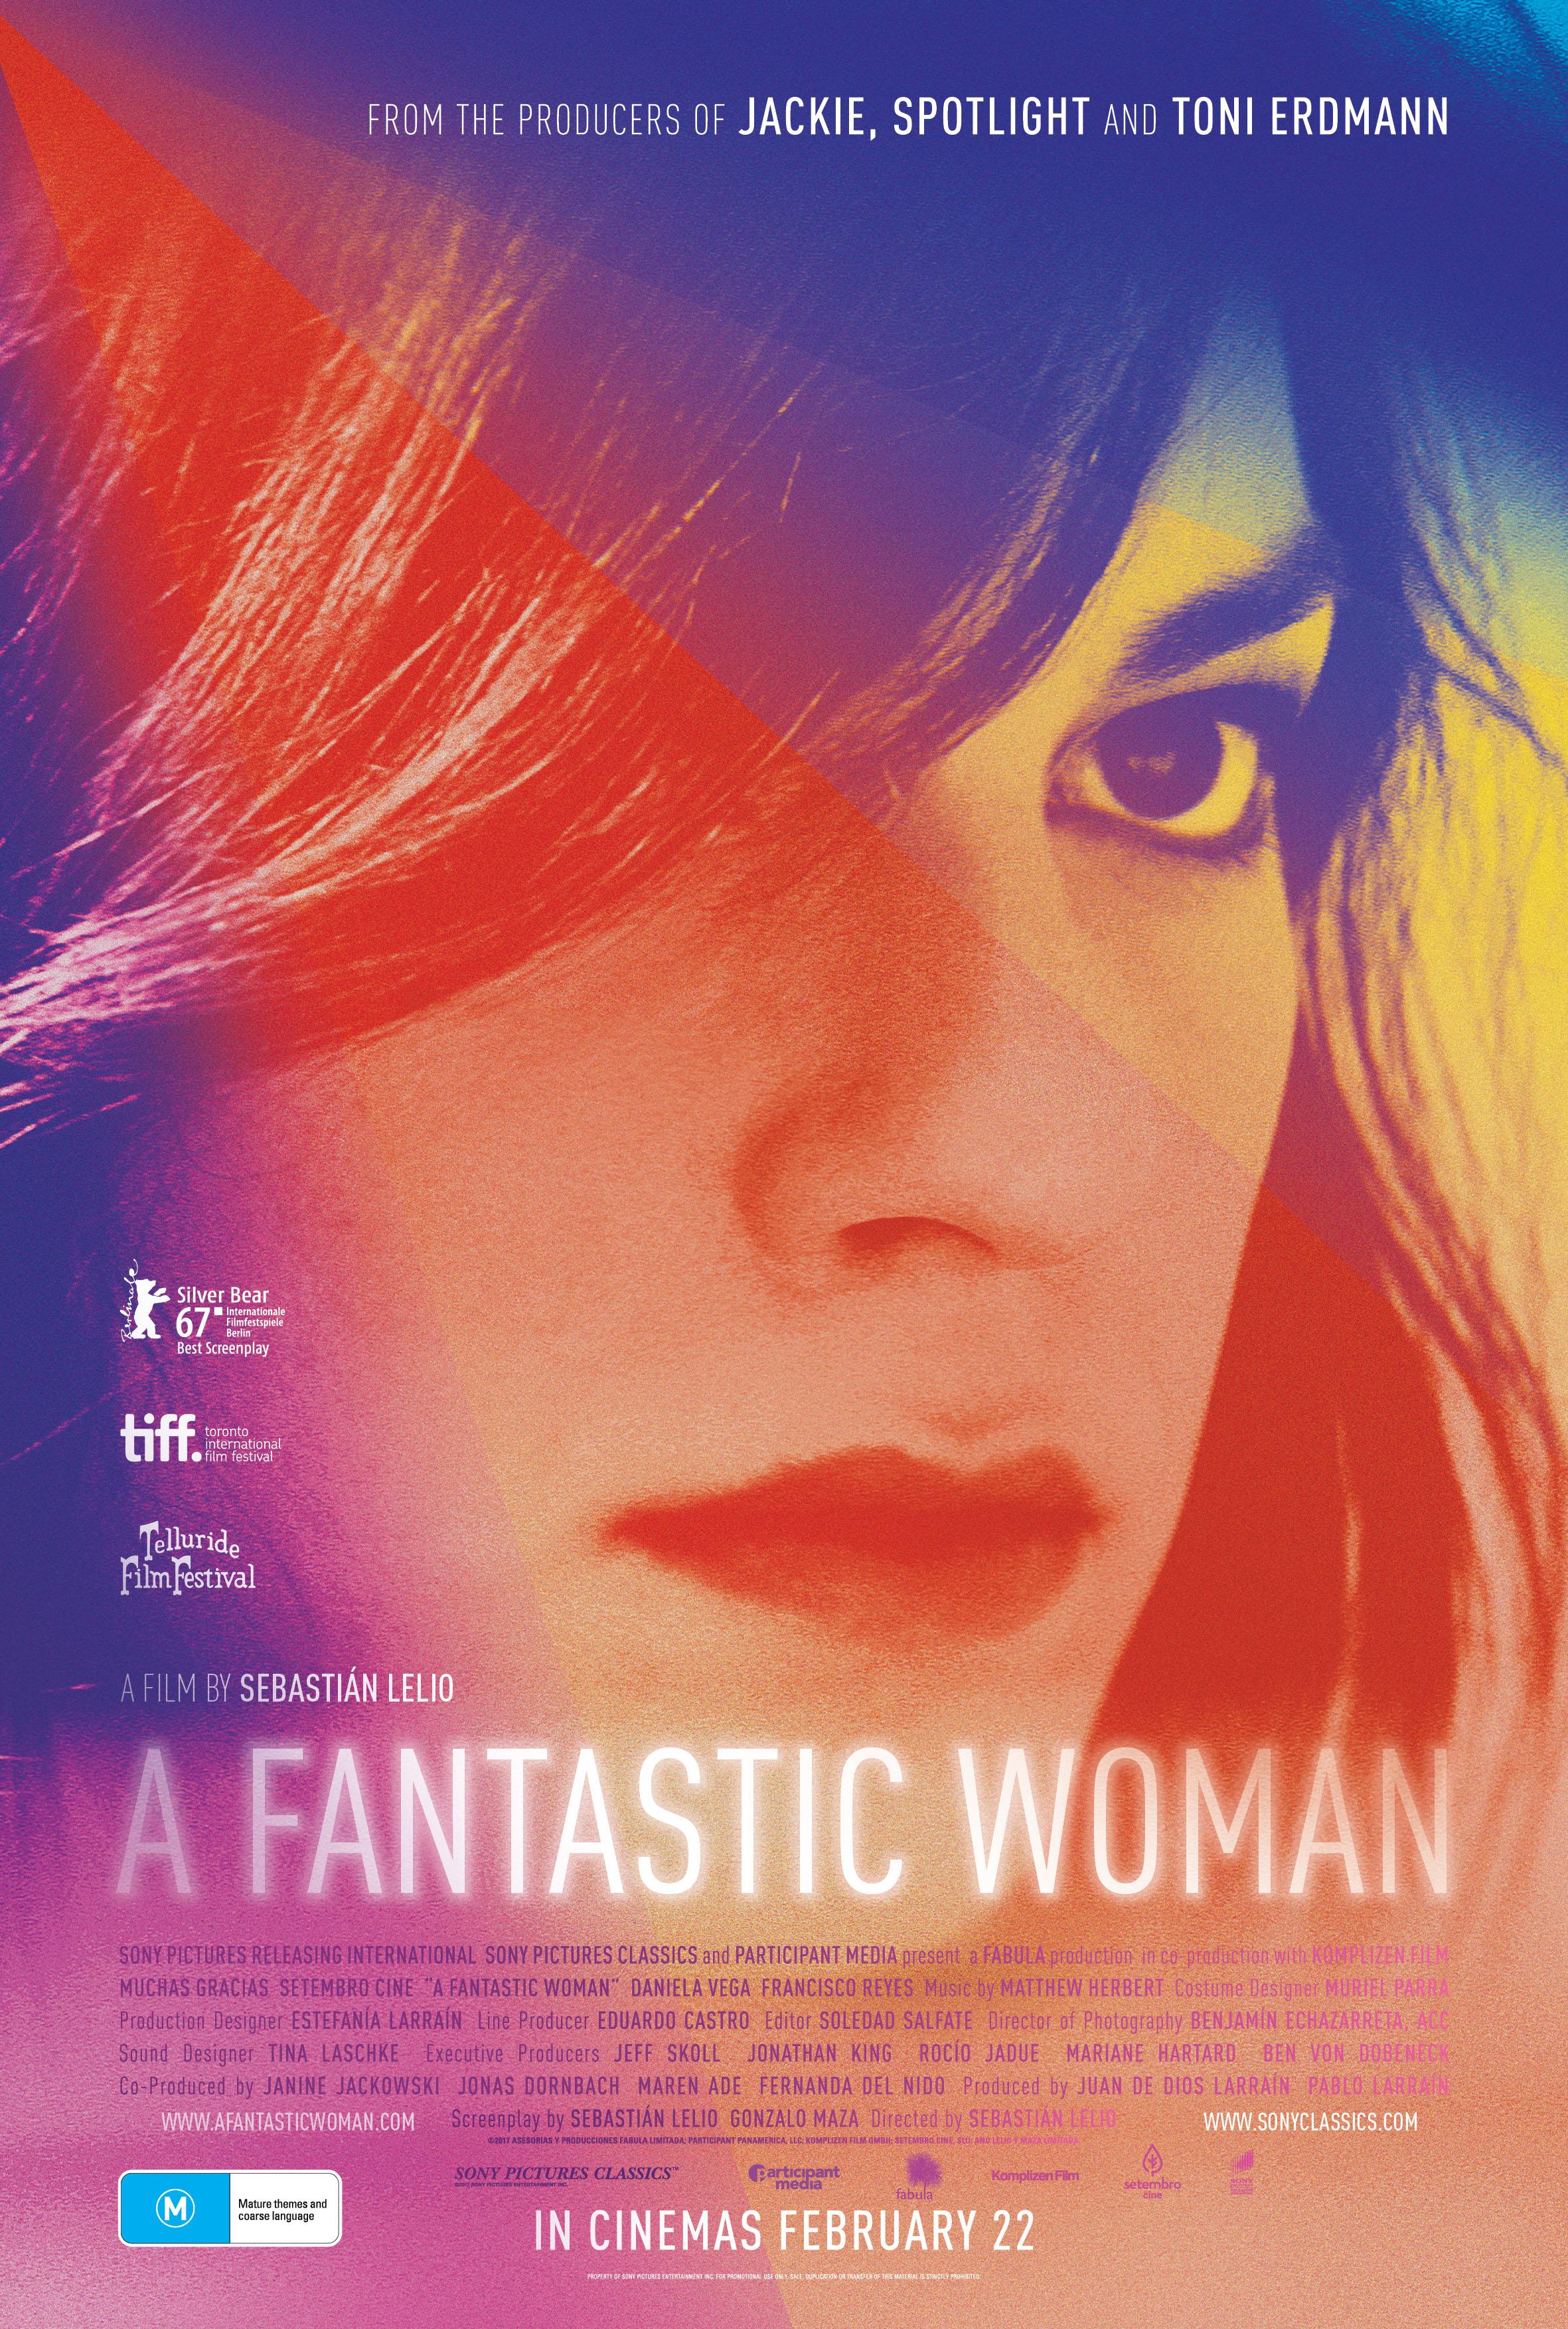 A Fantastic Woman  ( Una Mujer Fantástica ) (2017) dir.Sebastián Lelio Rated: R image:©2017  Sony Pictures Classics